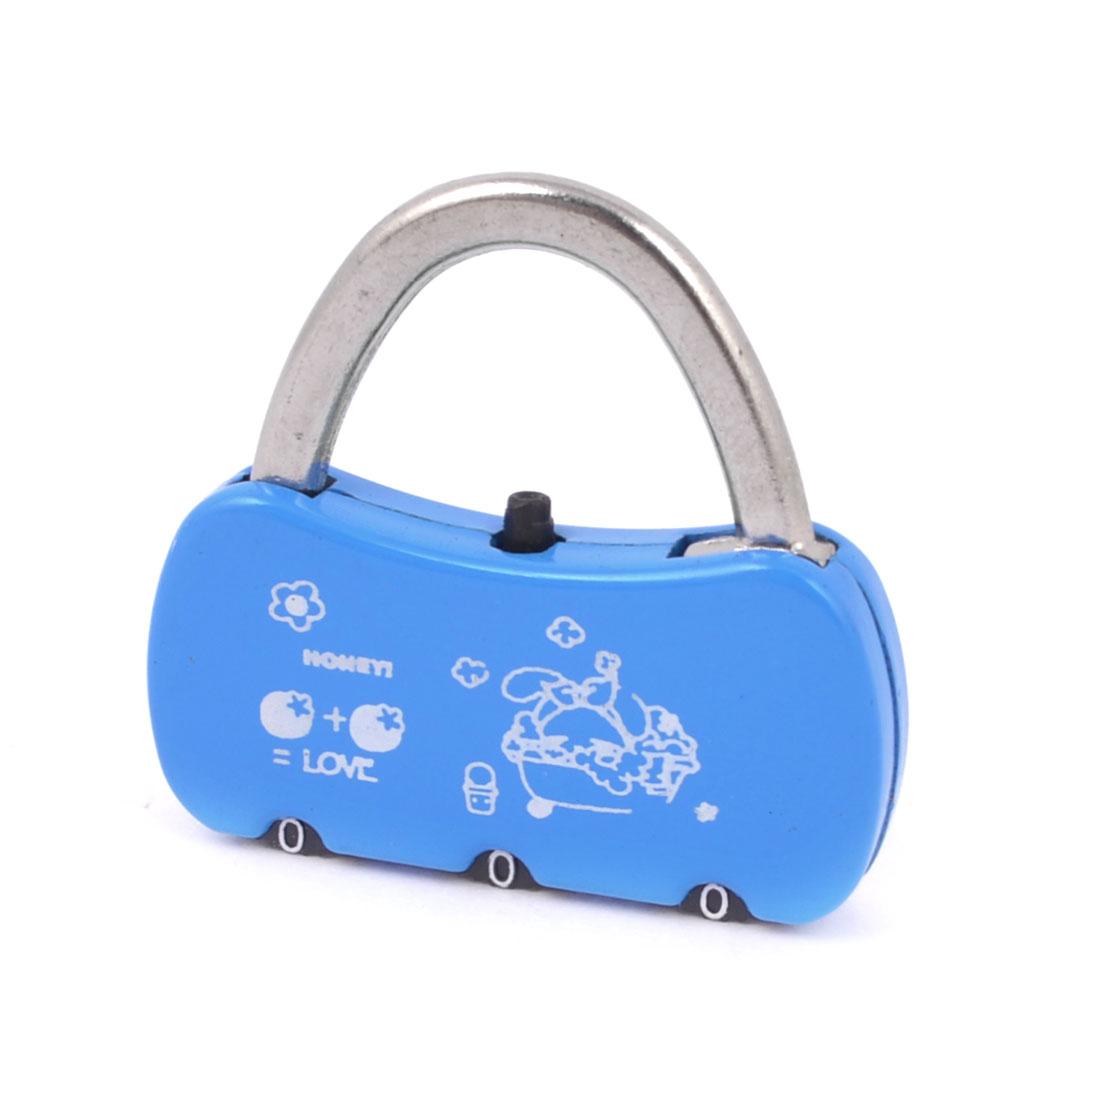 Blue Handbag Shaped Jewelry Box Drawer Combination Password Padlock